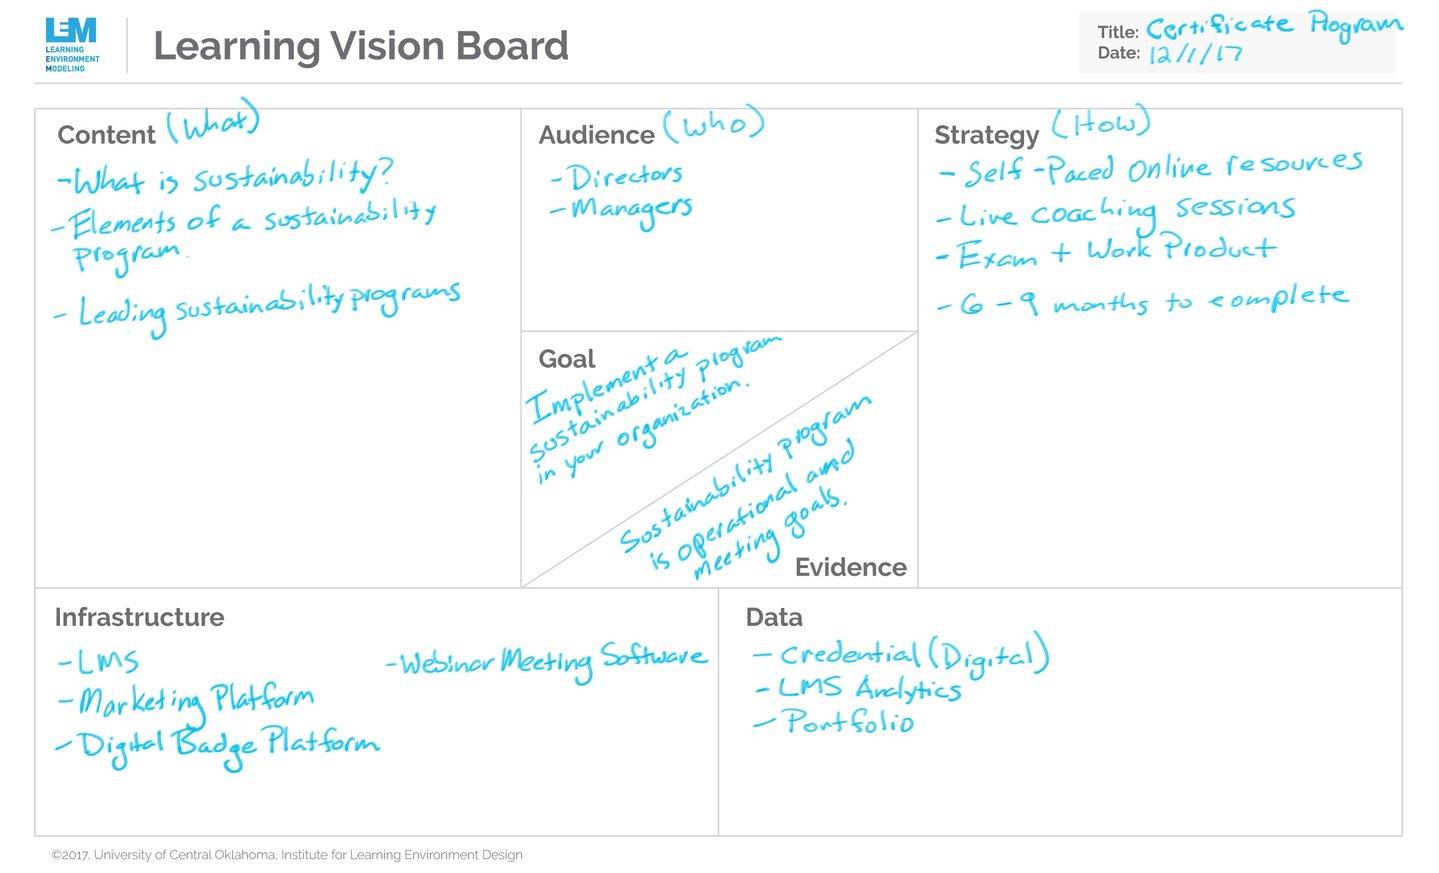 LearningVisionBoard_v01_highrez_examples_v01.jpg